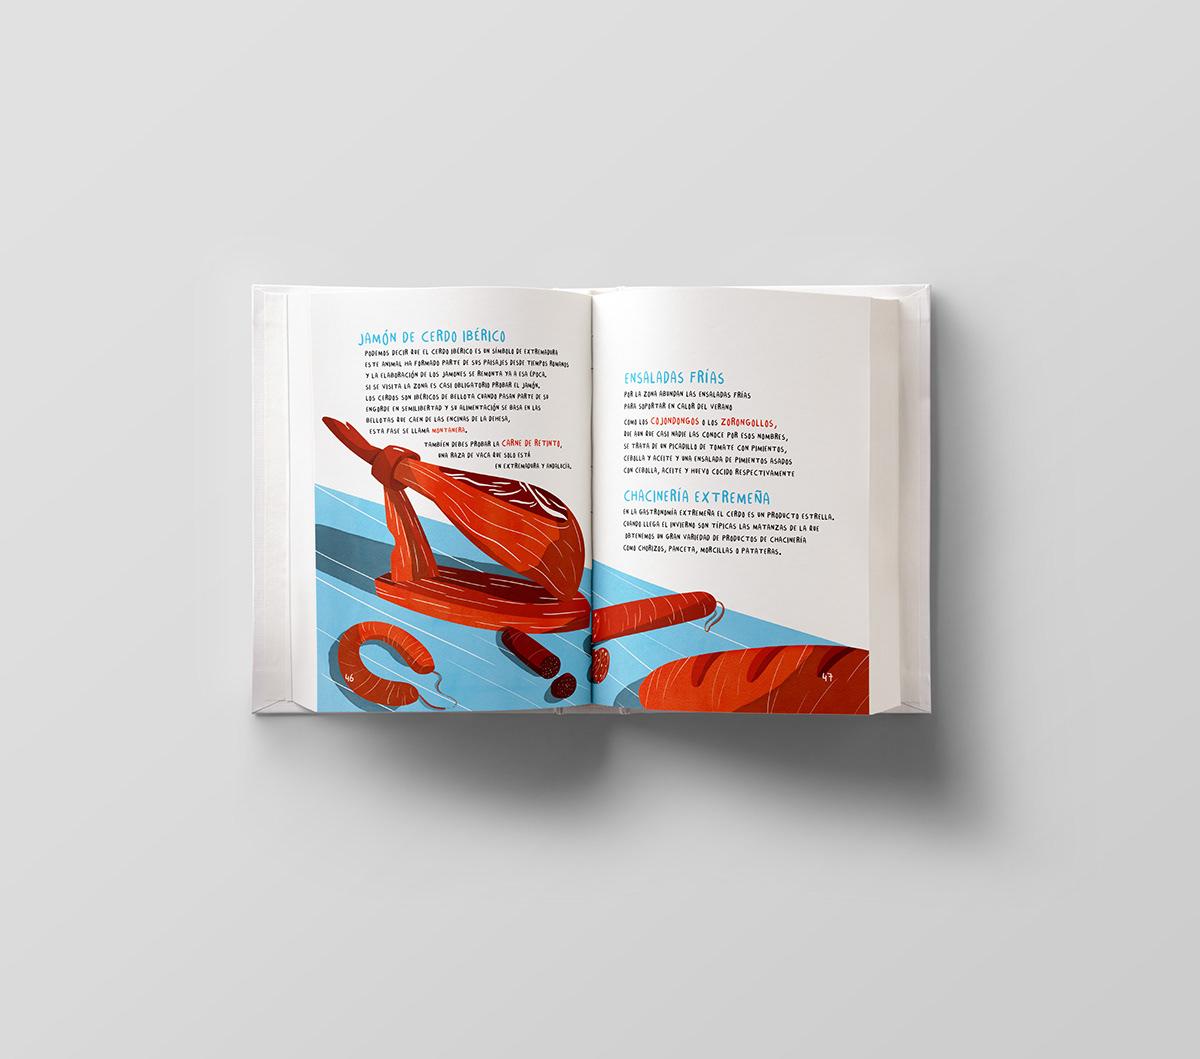 Guide city branding  Project editorial Diseño editorial mérida diseño gráfico graphic design  ILLUSTRATION